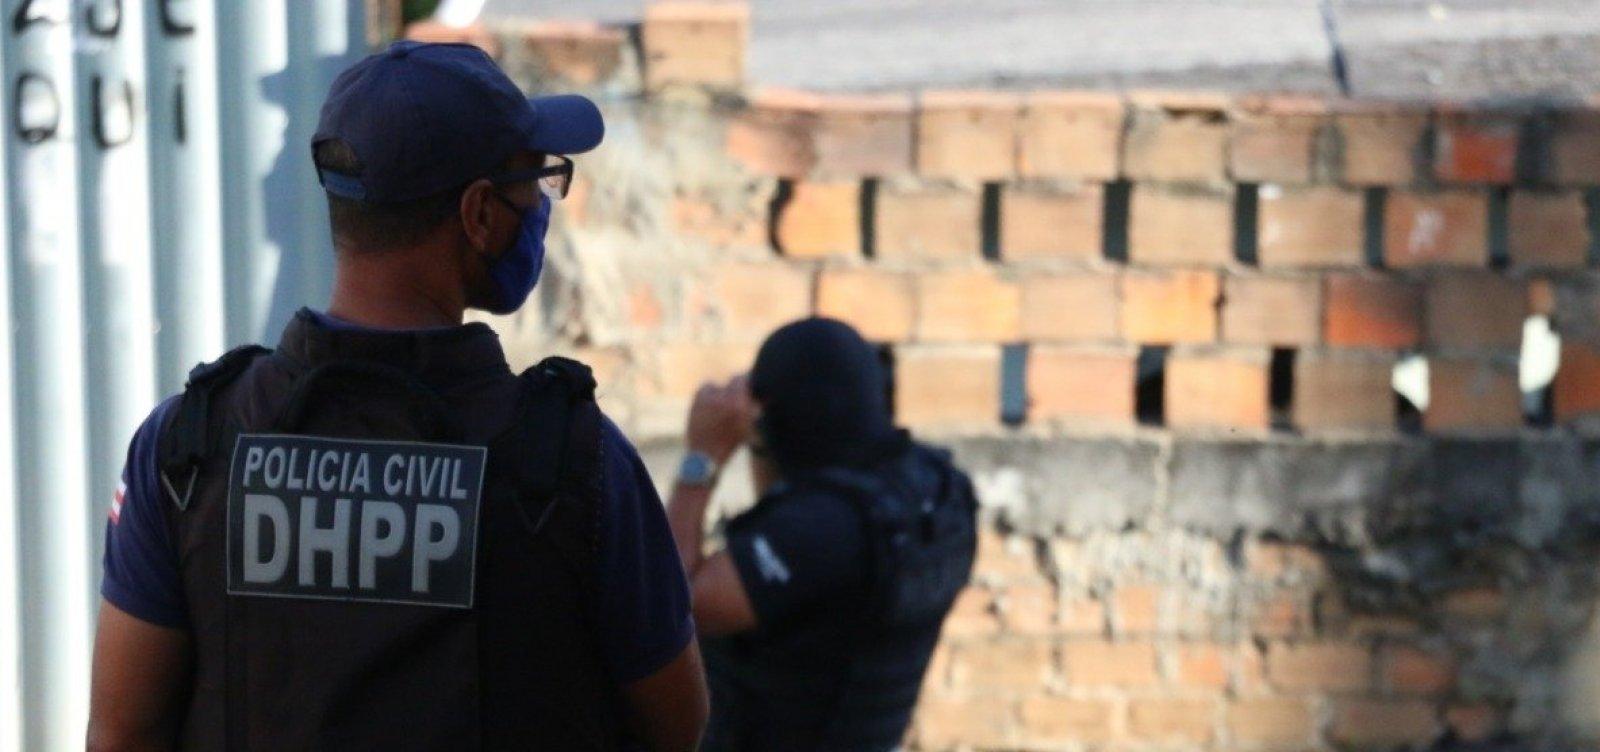 [Justiça converte para preventiva prisão de suspeitos de triplo homicídio na praia de Jaguaribe ]